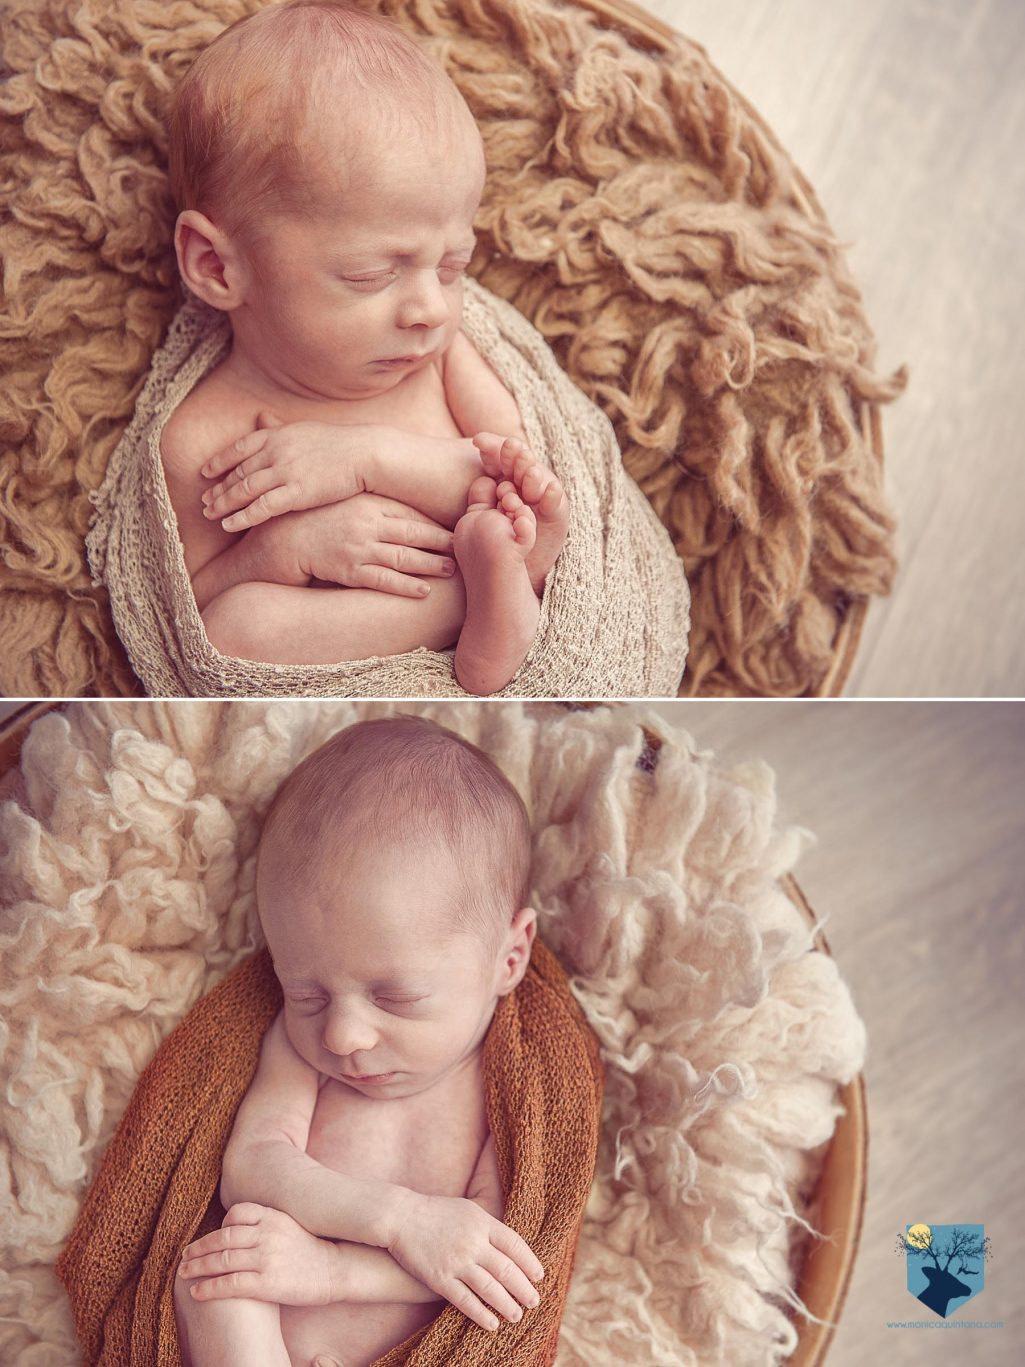 fotografia fotos fotografo fotografa fotograf girona figueres emporda, monica quintana, bebes niños, recien nacido, newborn familia retrato gemelos bessons nado